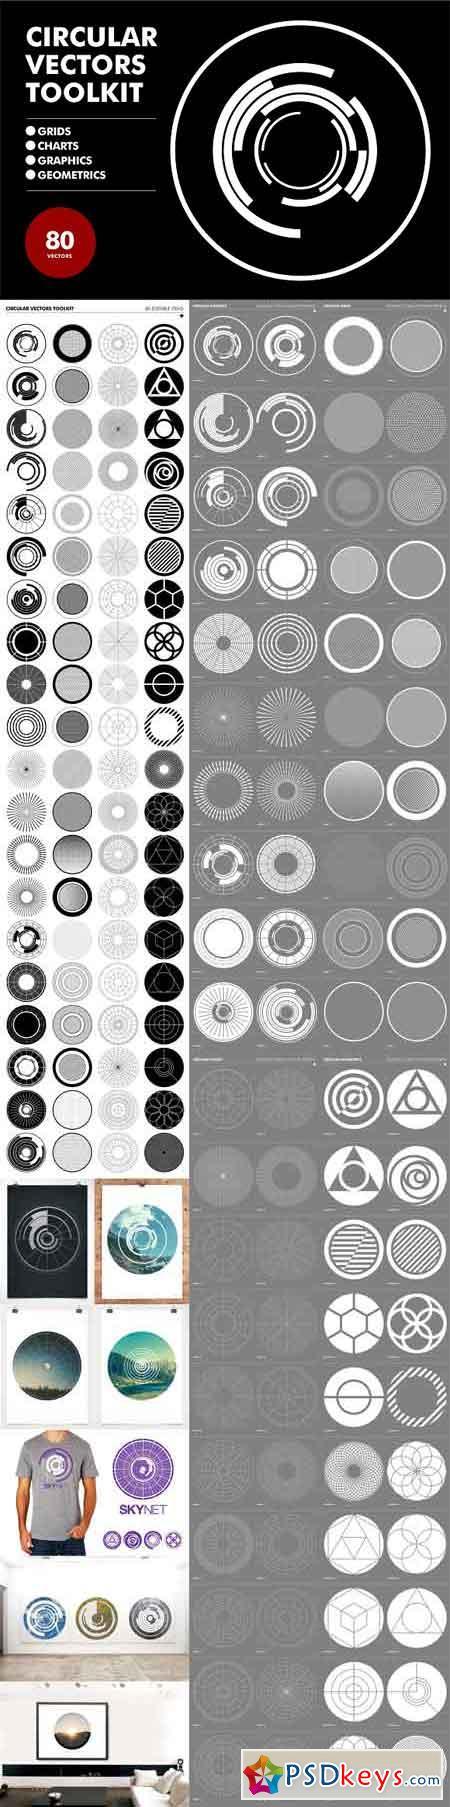 Circular Vectors Toolkit - 80 items 1114731